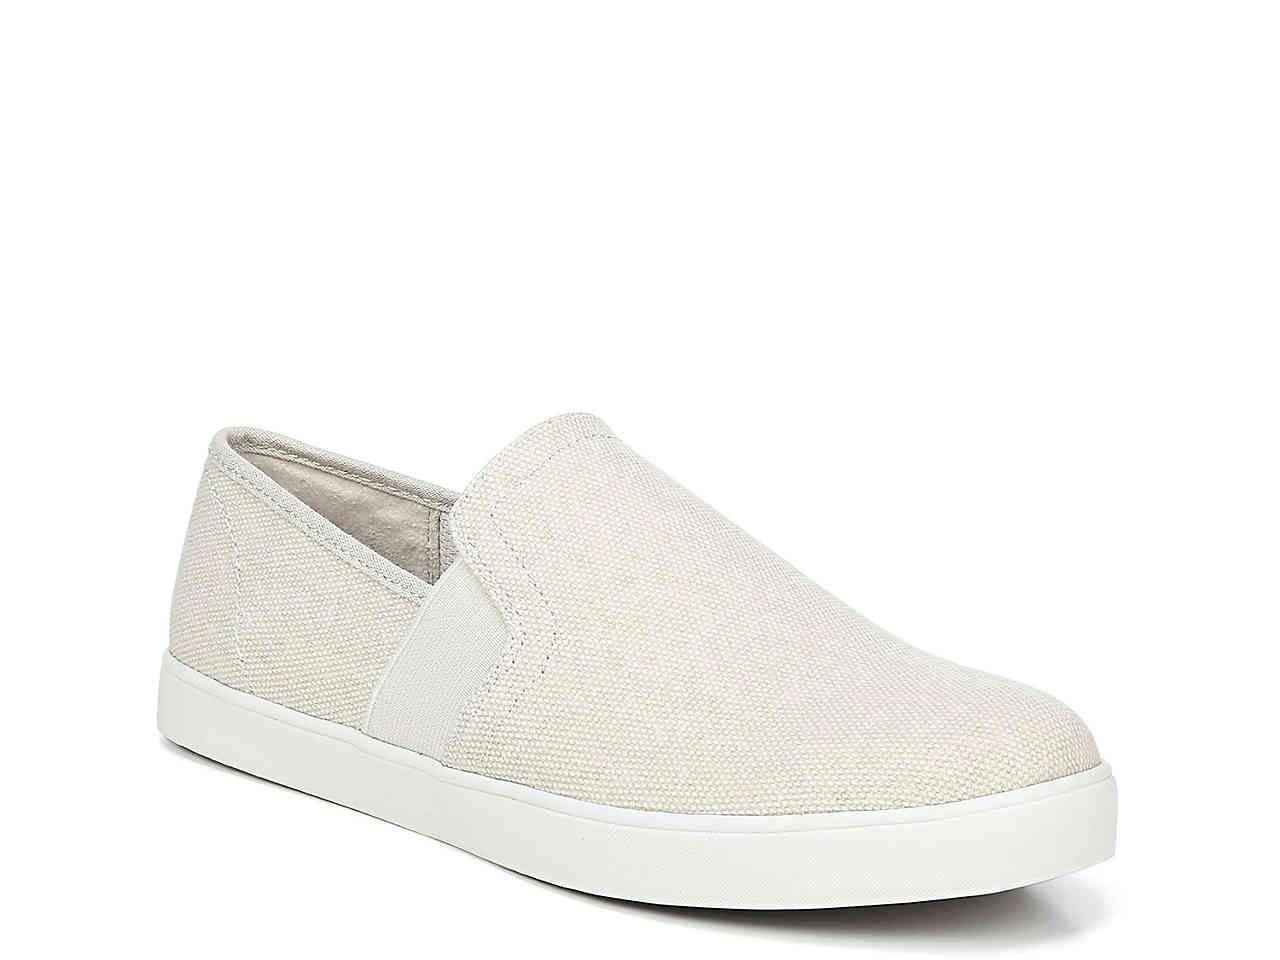 Dr. Scholl's Liberty Slip-On Sneaker